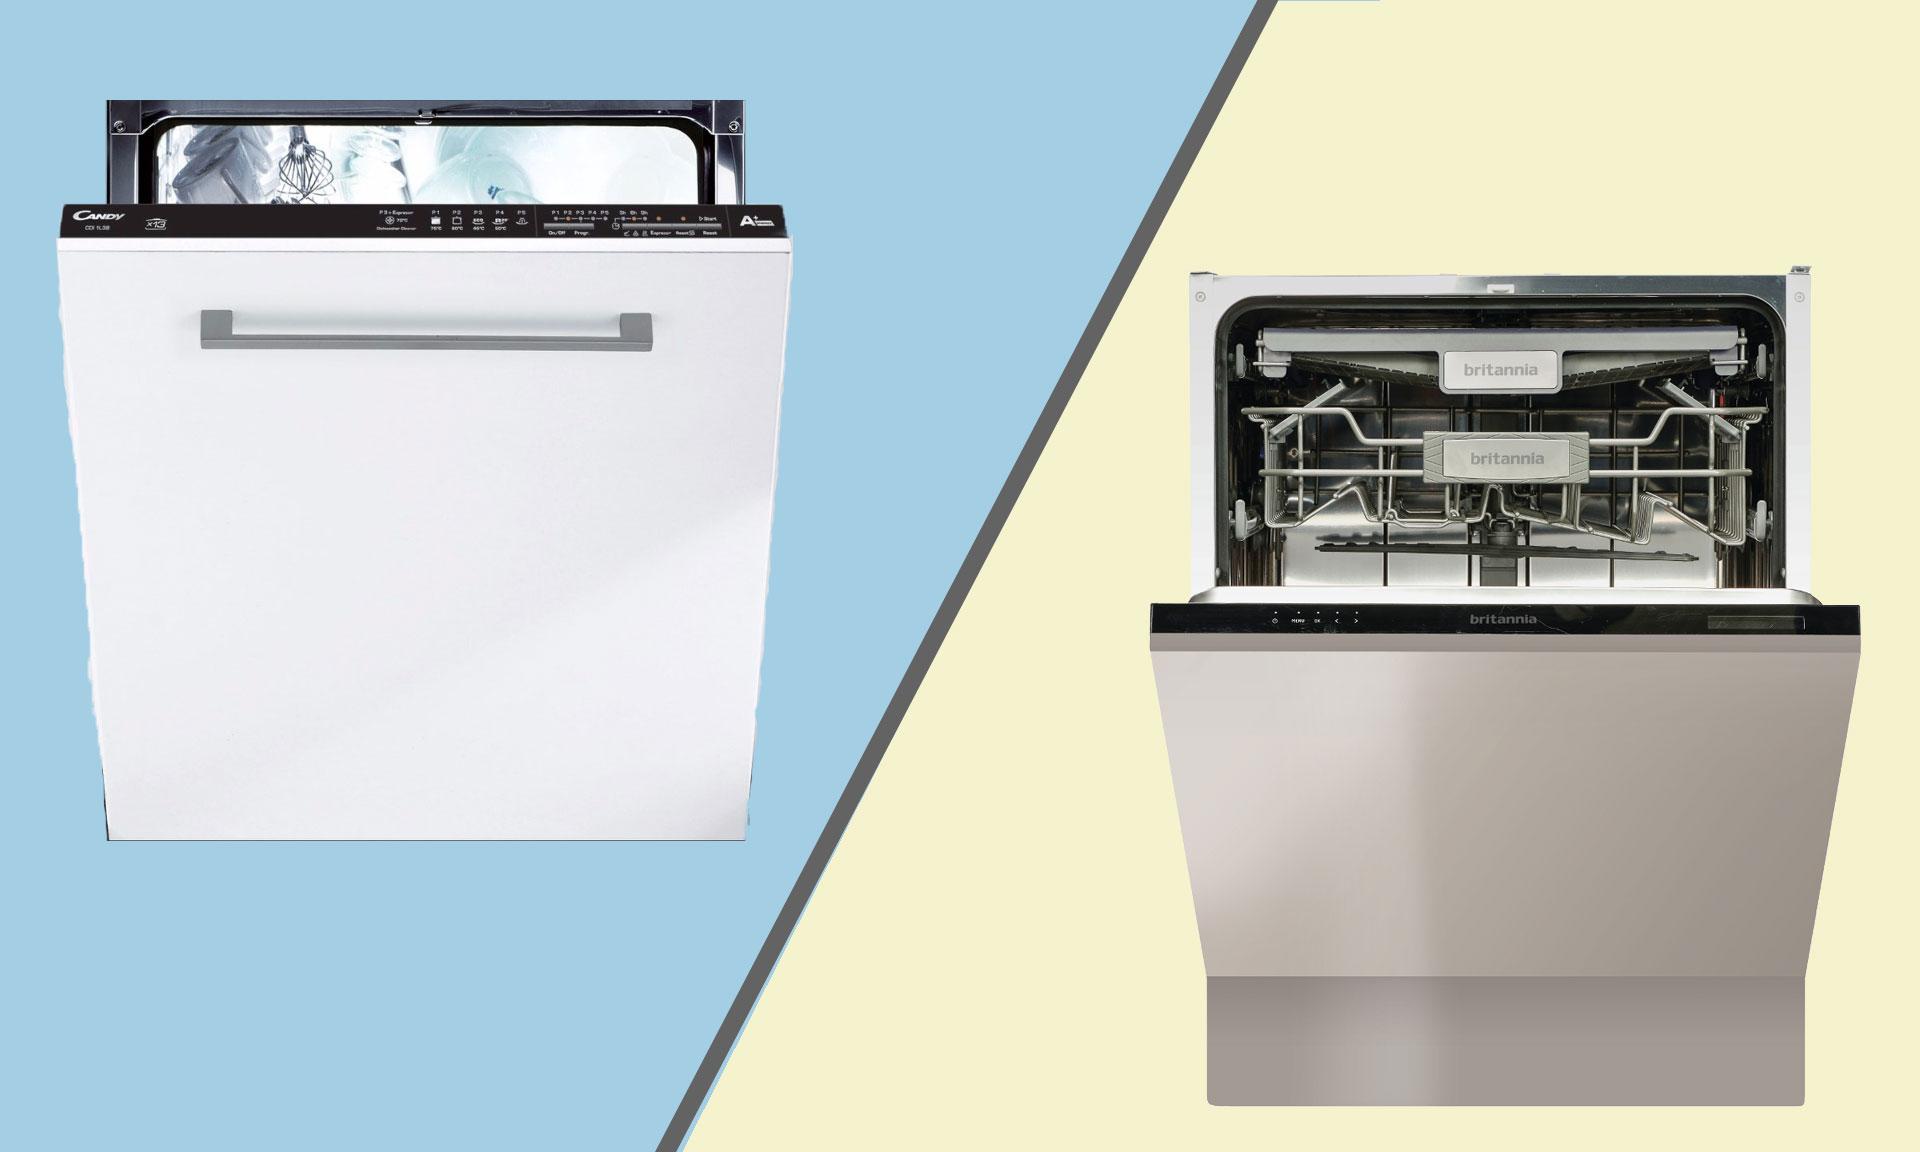 Candy and Britannia dishwashers